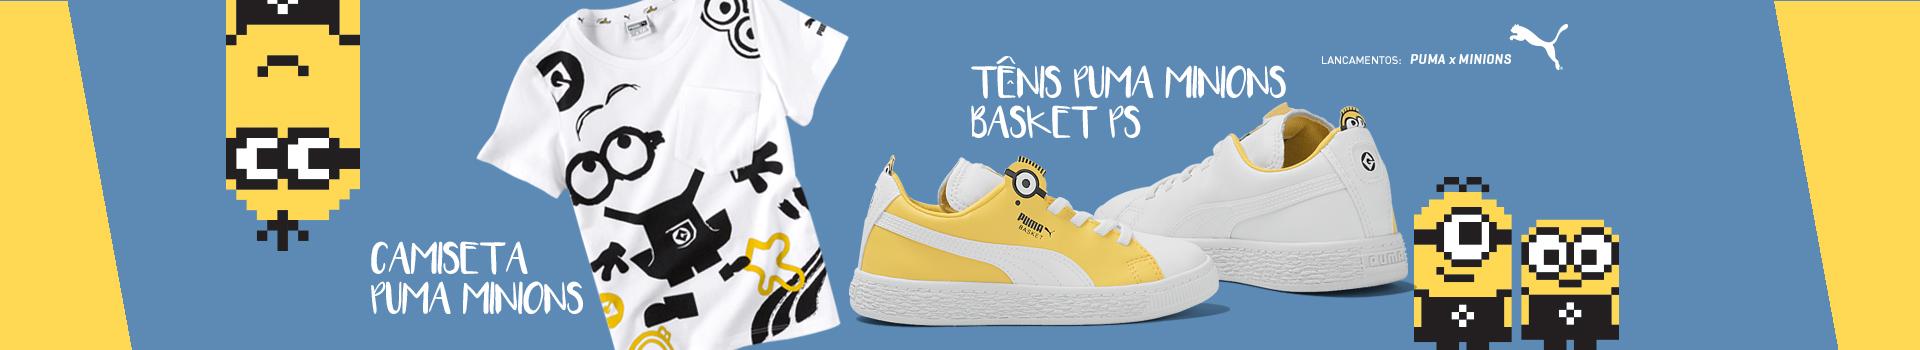 tvdesk_p2-09_11_18-Puma_Minions